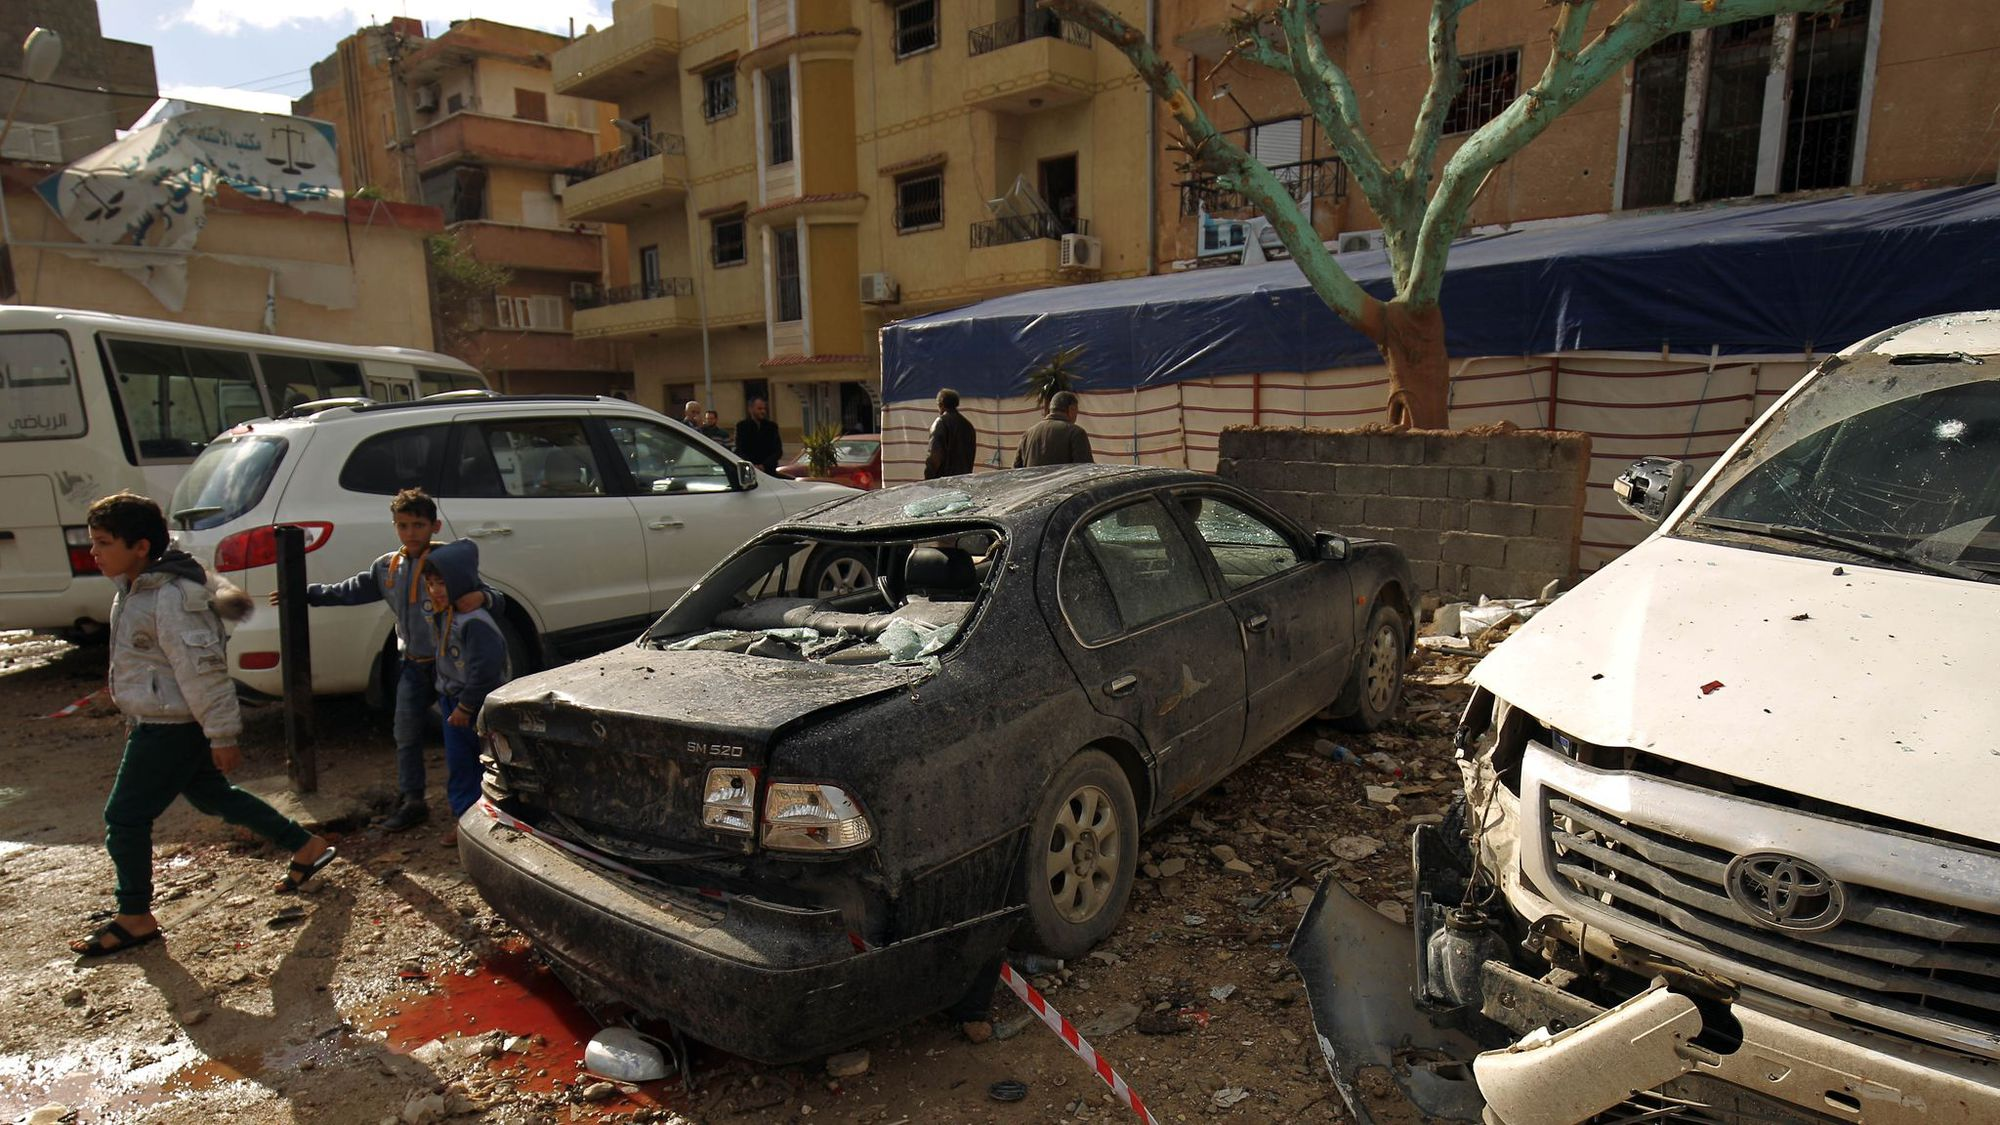 Libye : lourd bilan humain après un double attentat à Benghazi